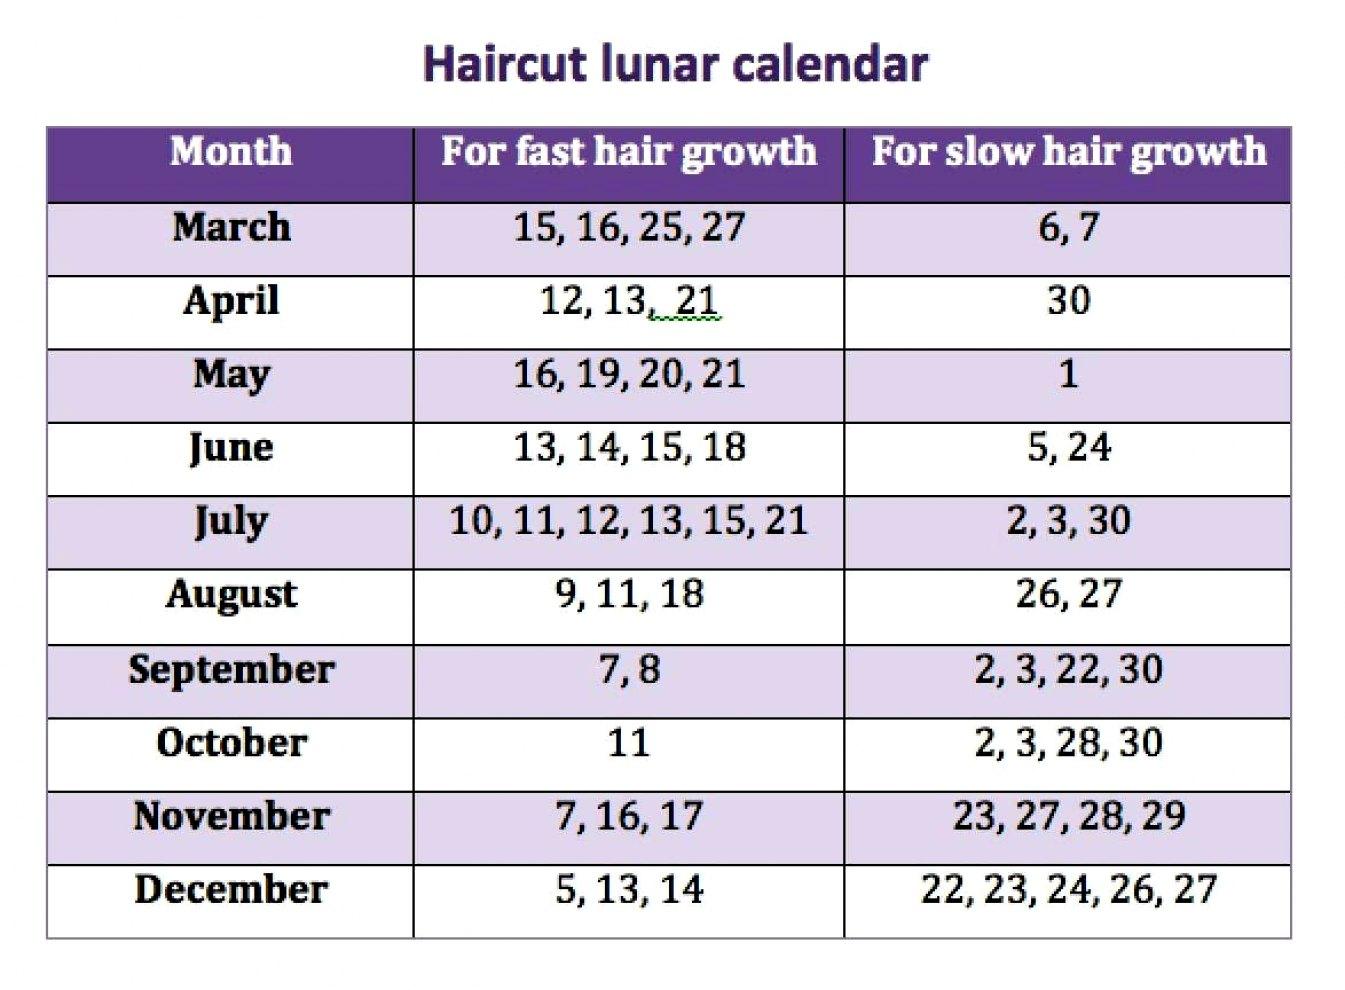 Moon Calendar Haircut Choose For Hair Care Amazing Color pertaining to Lunar Hair Chart